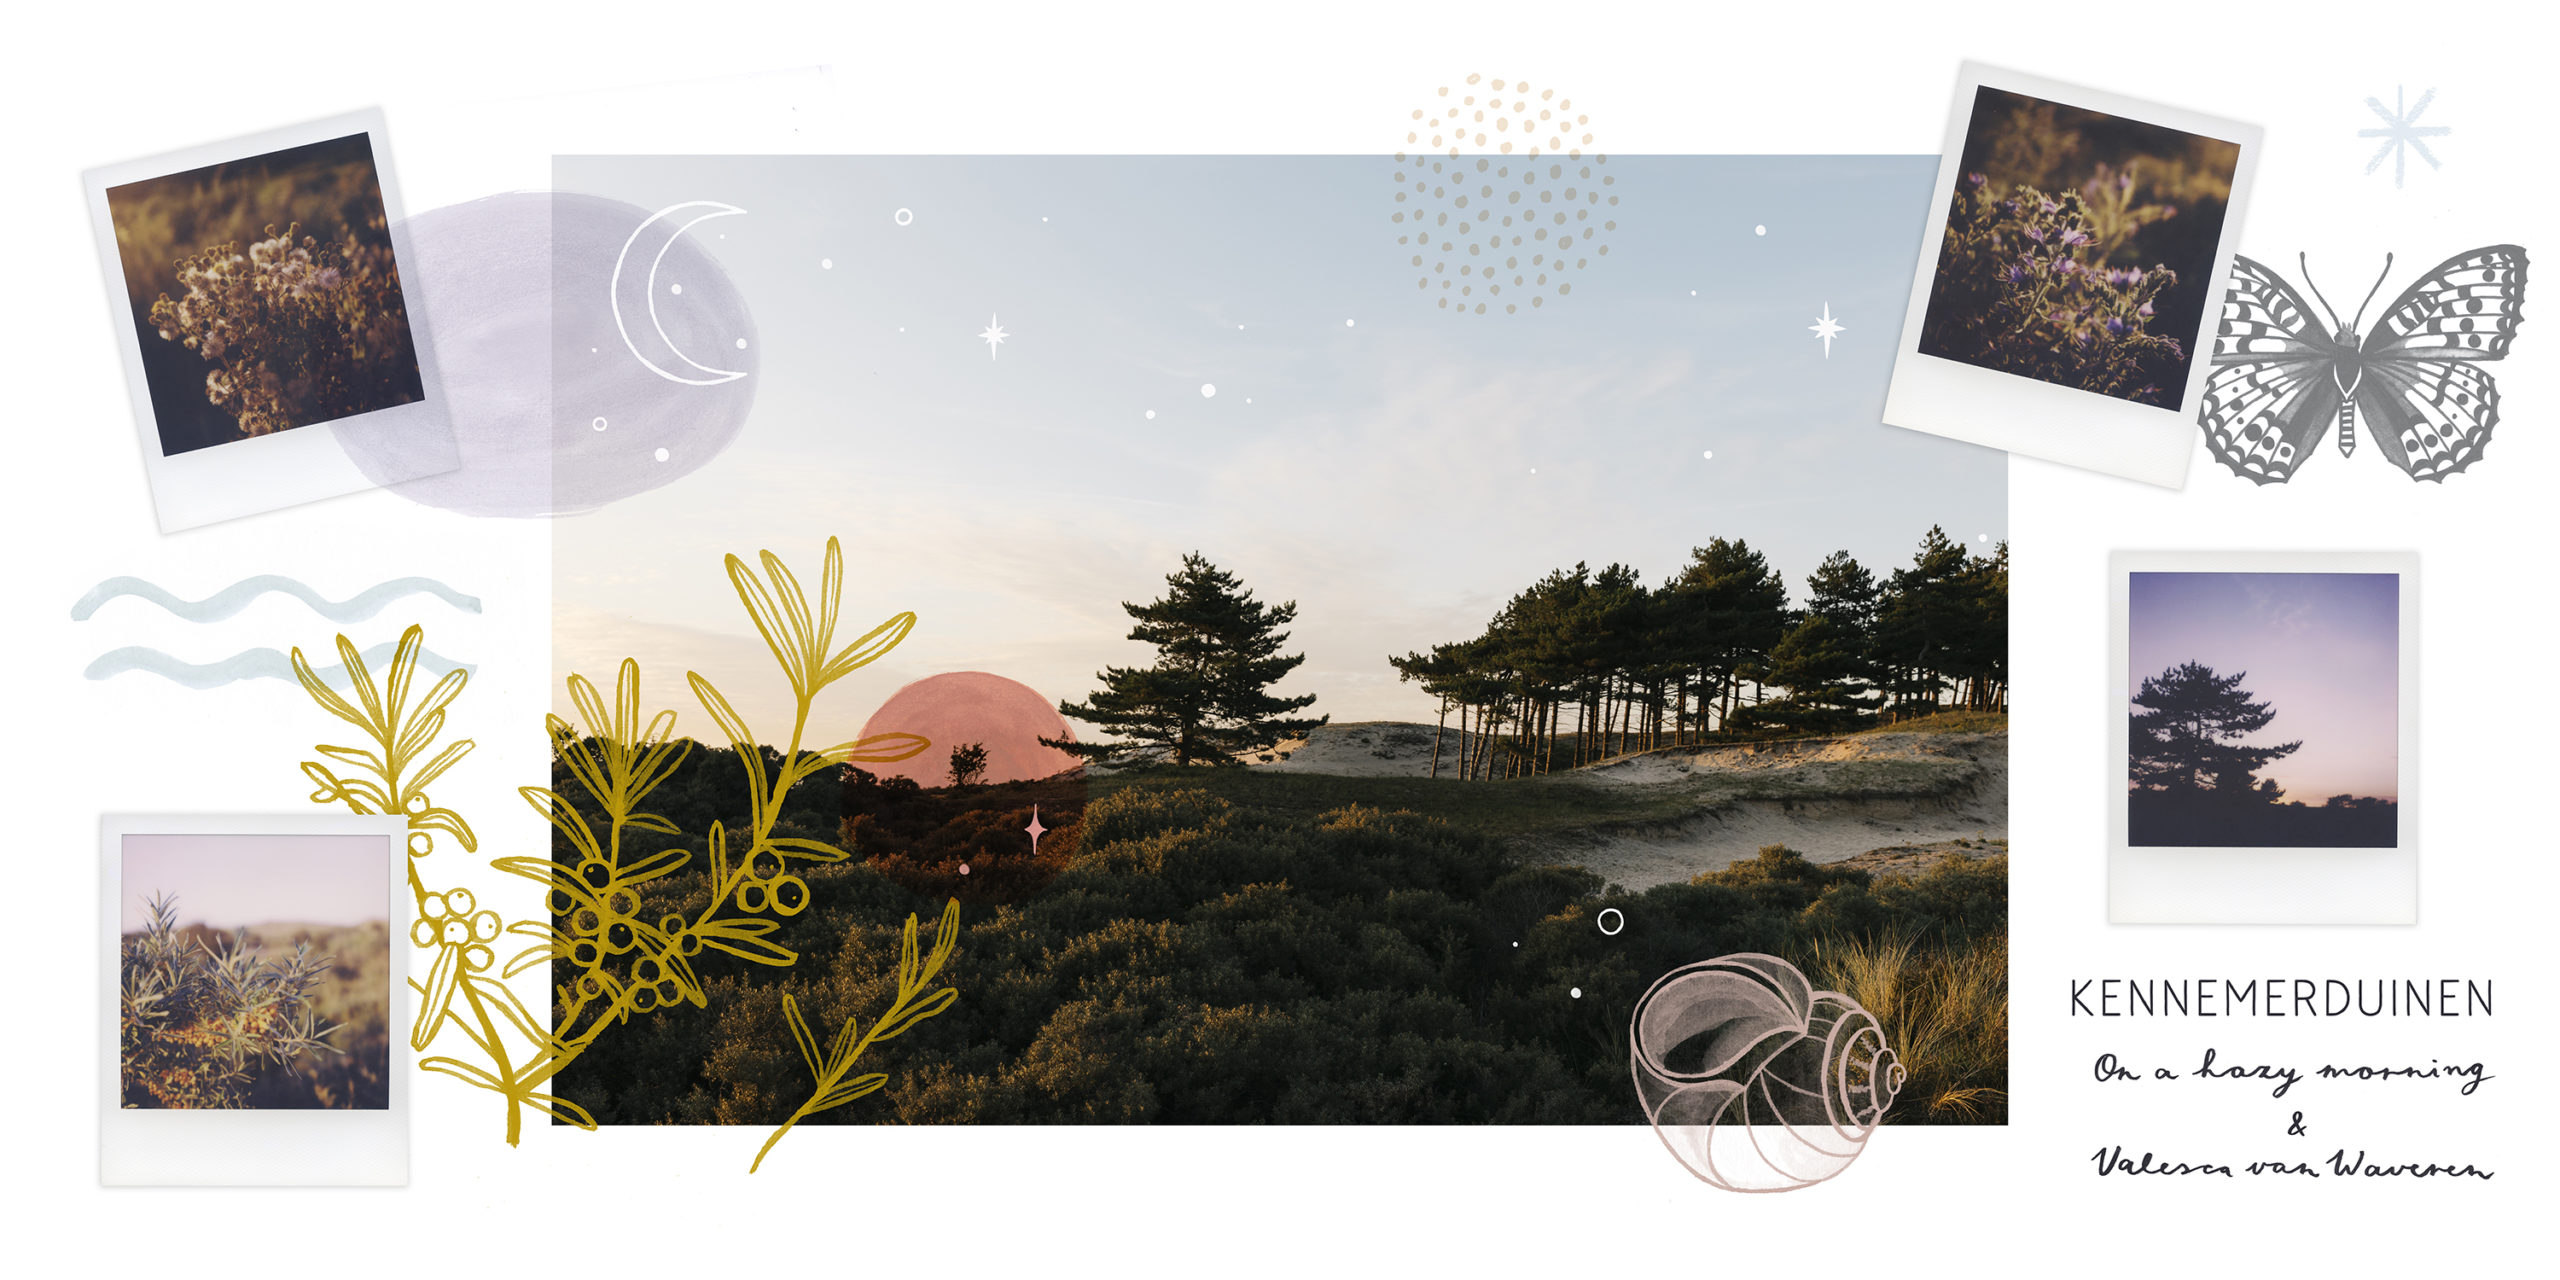 Adobe_Lewis_Landscape_Valesca_X_On_a_hazy_morning_draft4